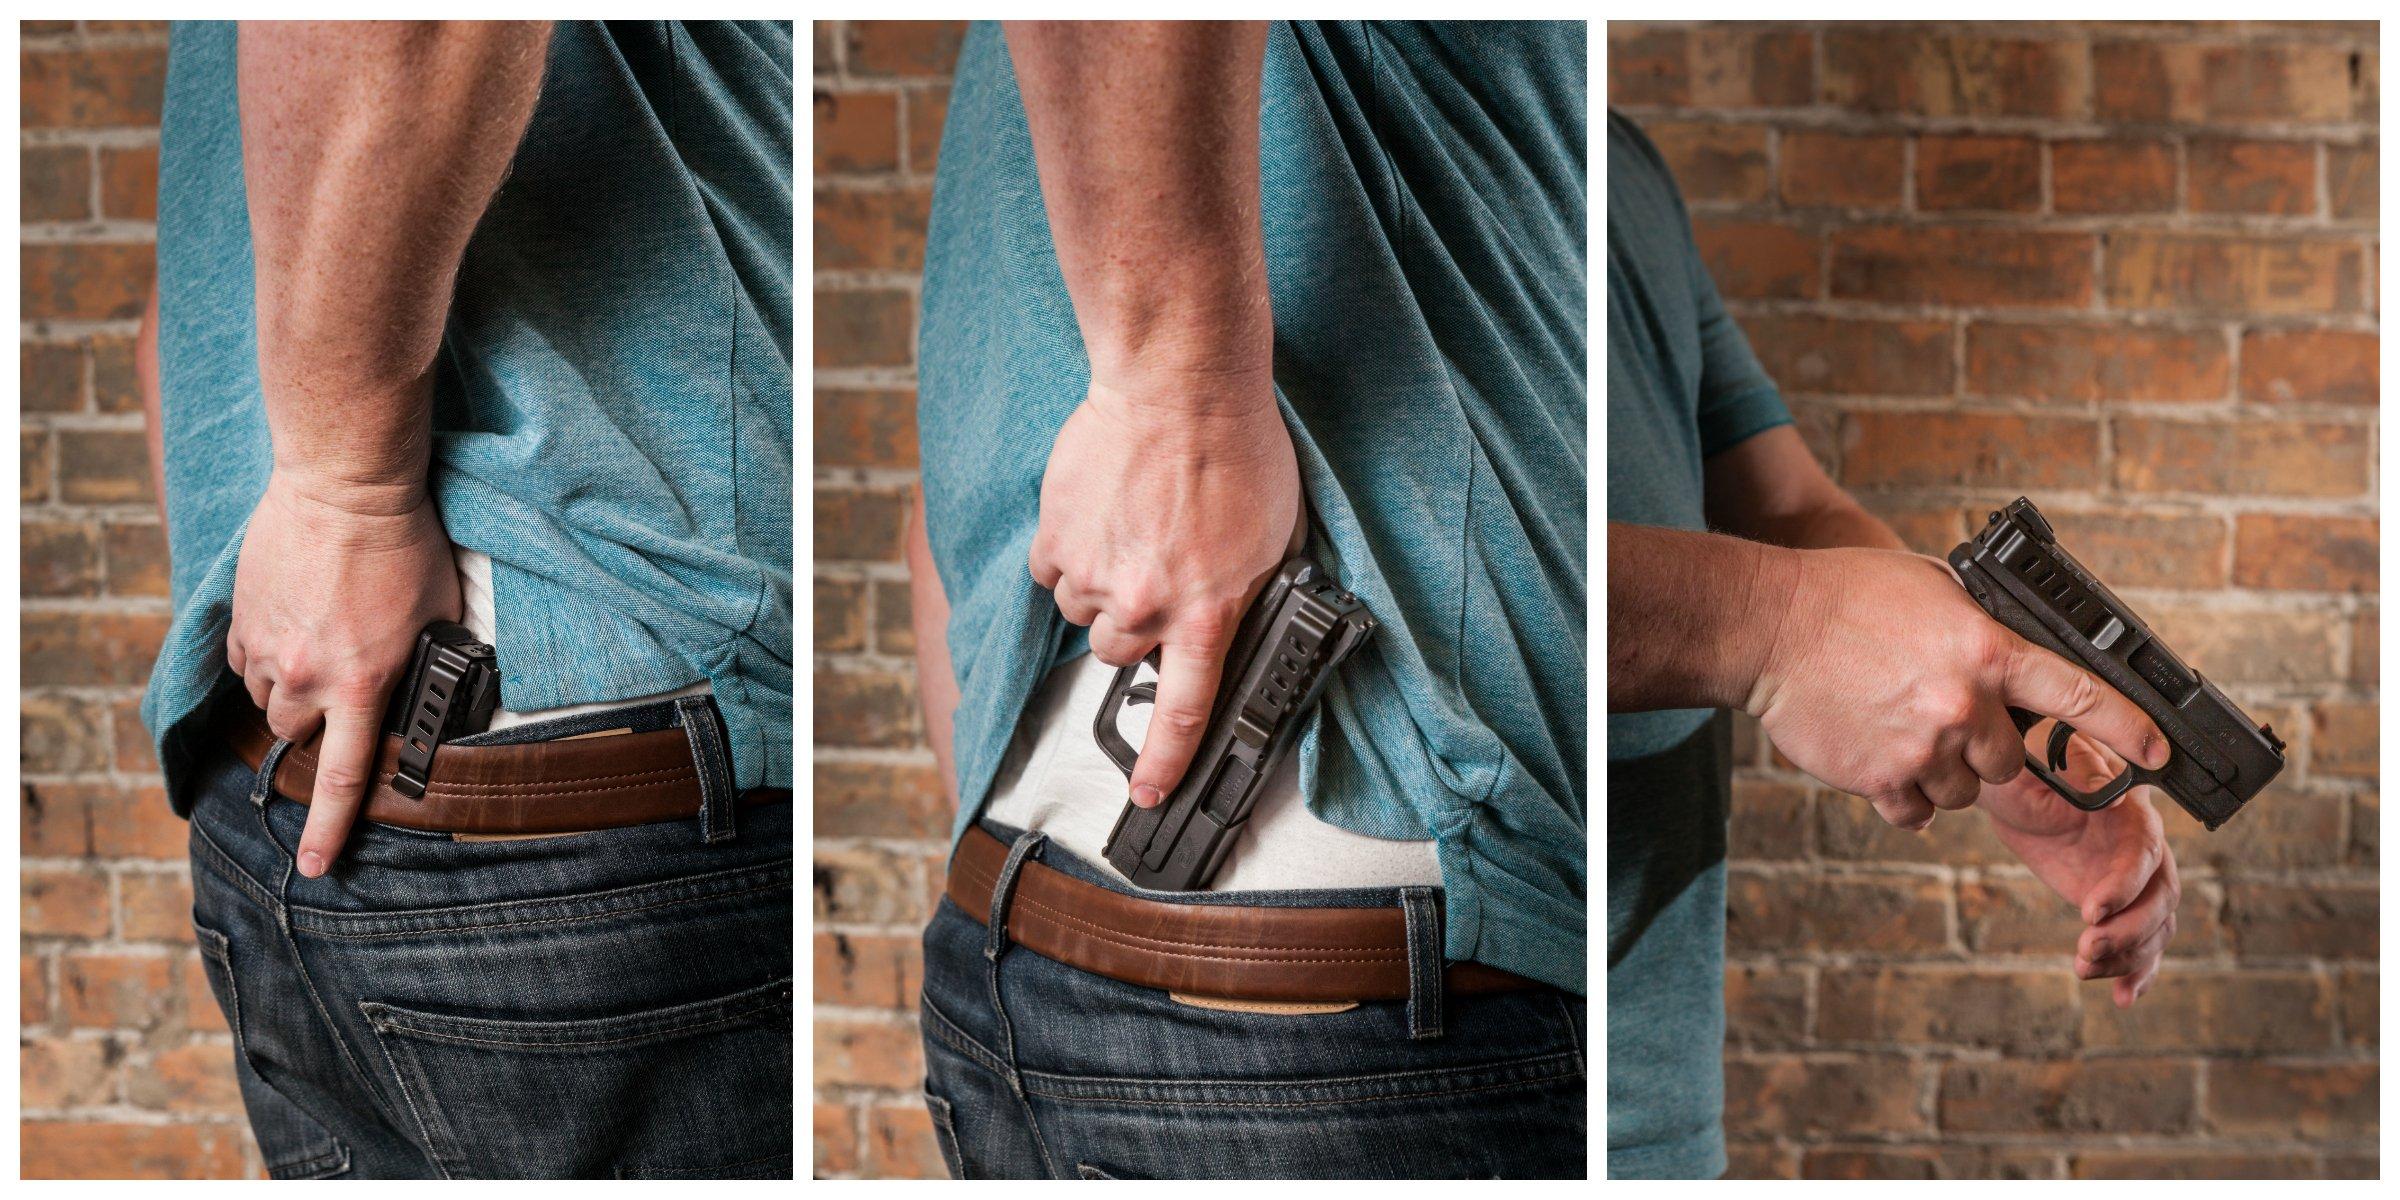 Belt Clip, Fits Taurus PT111 G2 and 709 Slim, Ambidextrous, Black